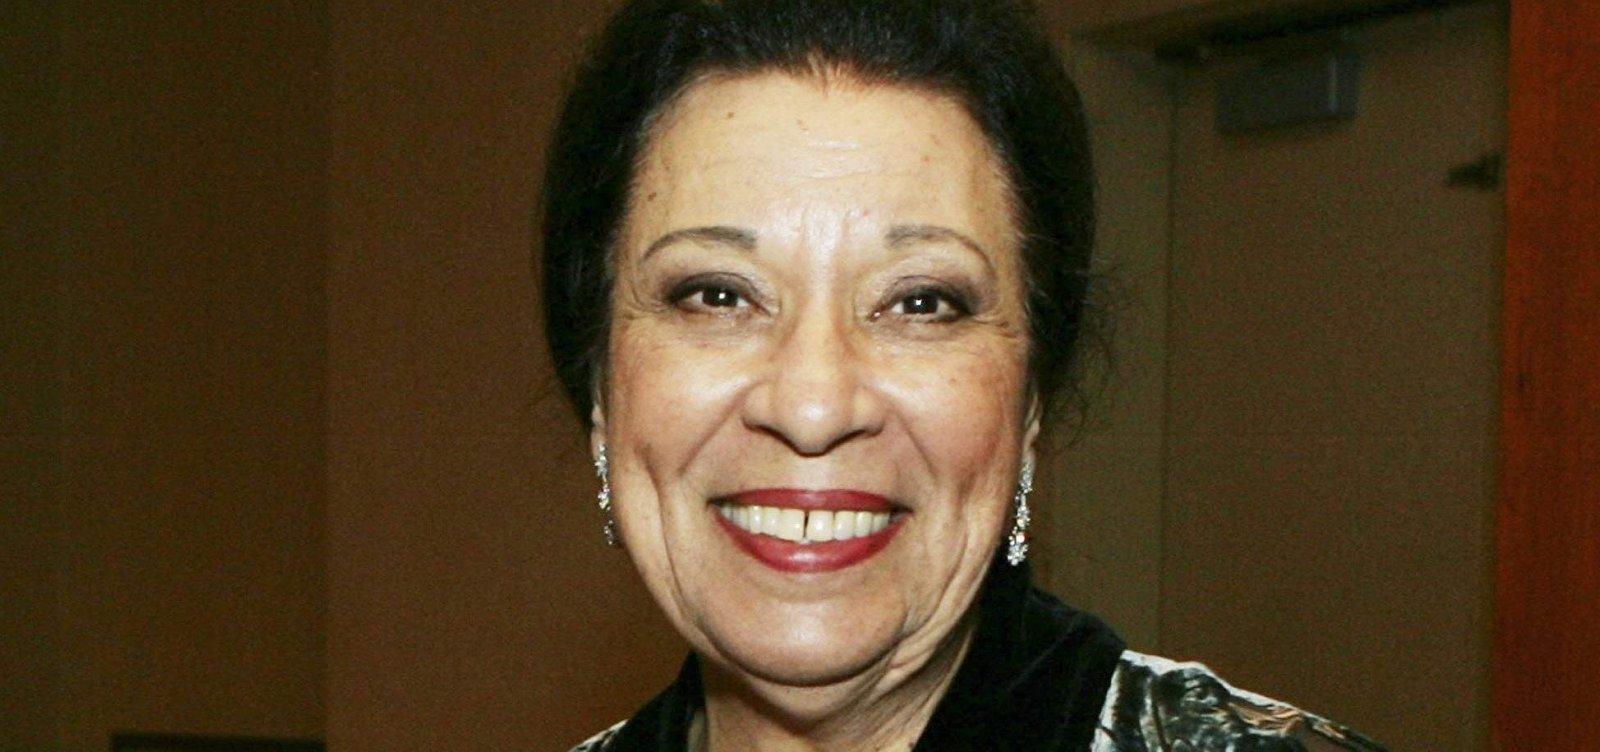 Morre Shelley Morrison, da série 'Will & Grace', aos 83 anos